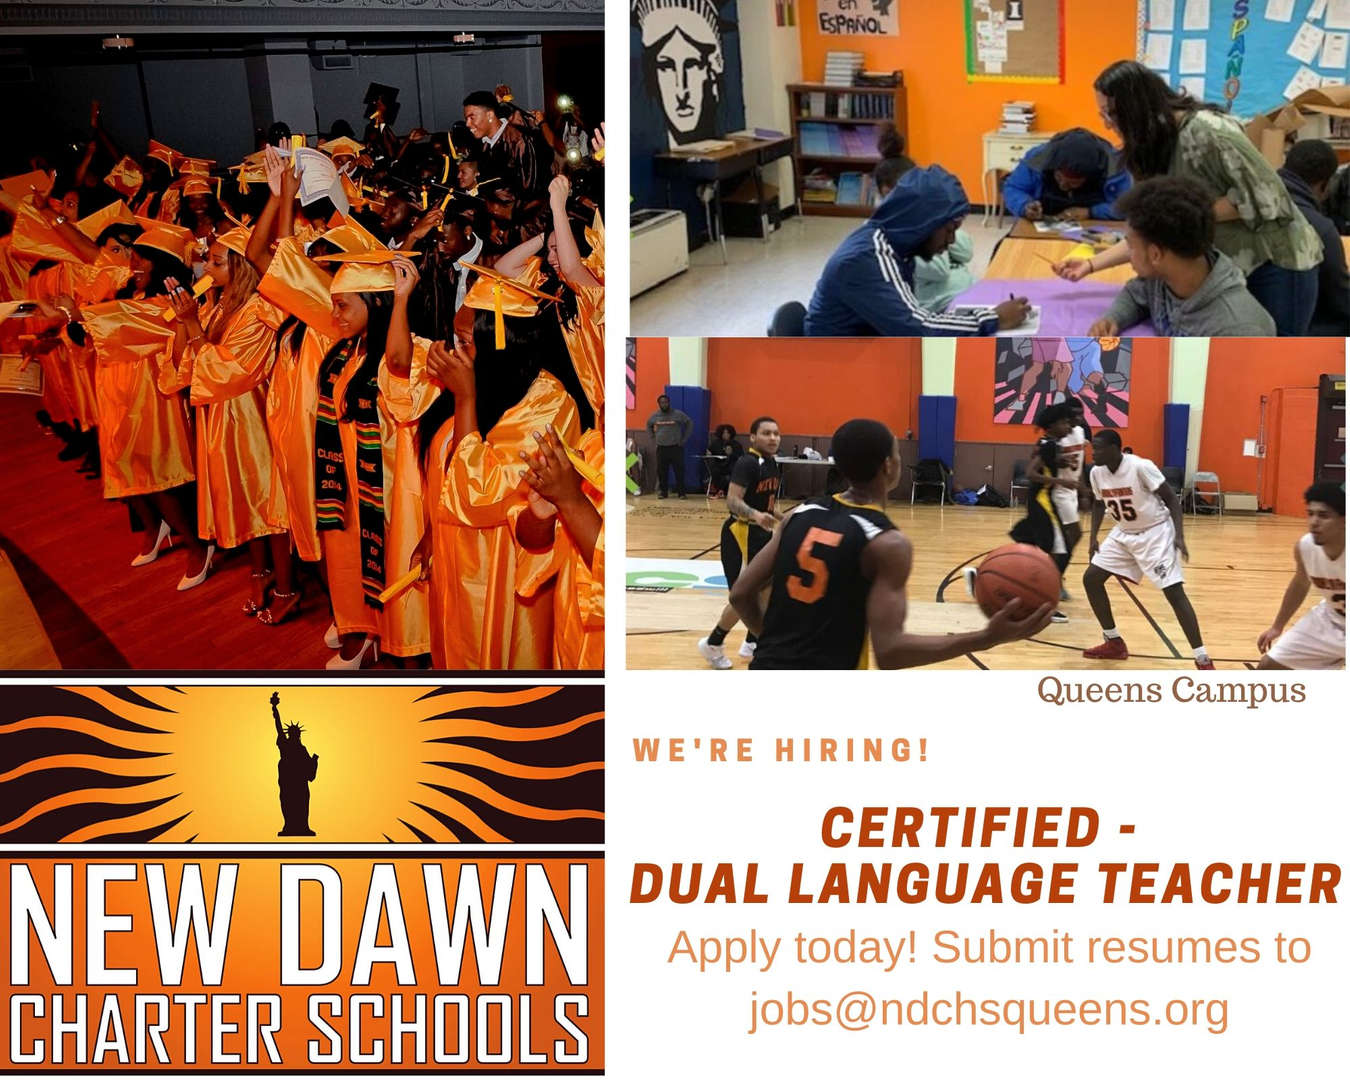 Certified - Dual Language Teacher